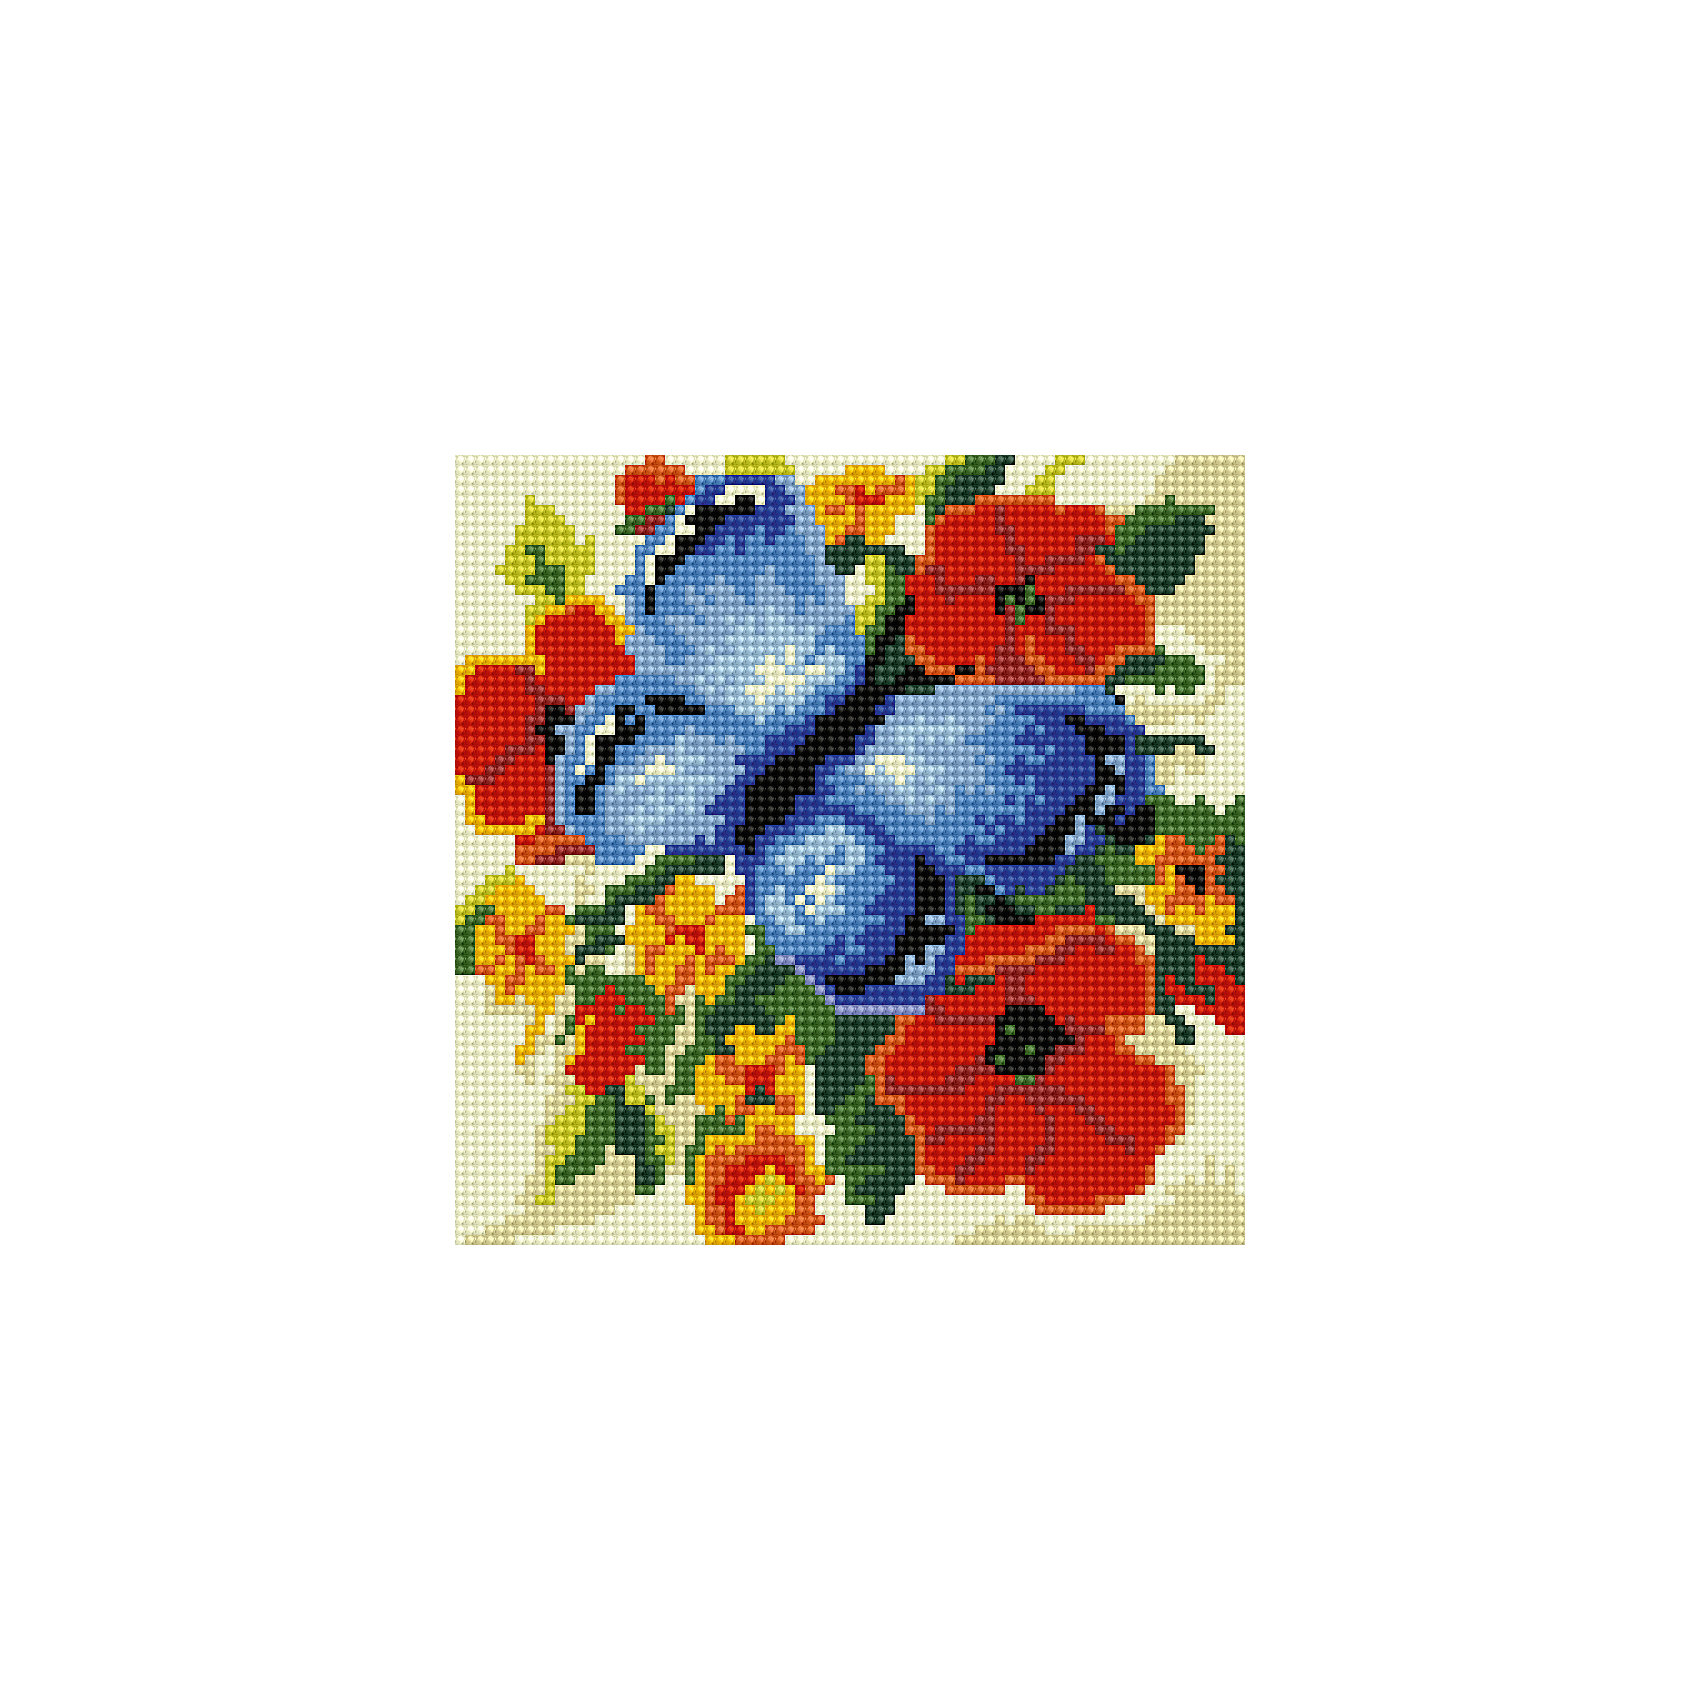 Schreiber Алмазная мозаика по номерами Синяя бабочка 20*20 см schreiber алмазная мозаика по номерами ежик 20 20 см